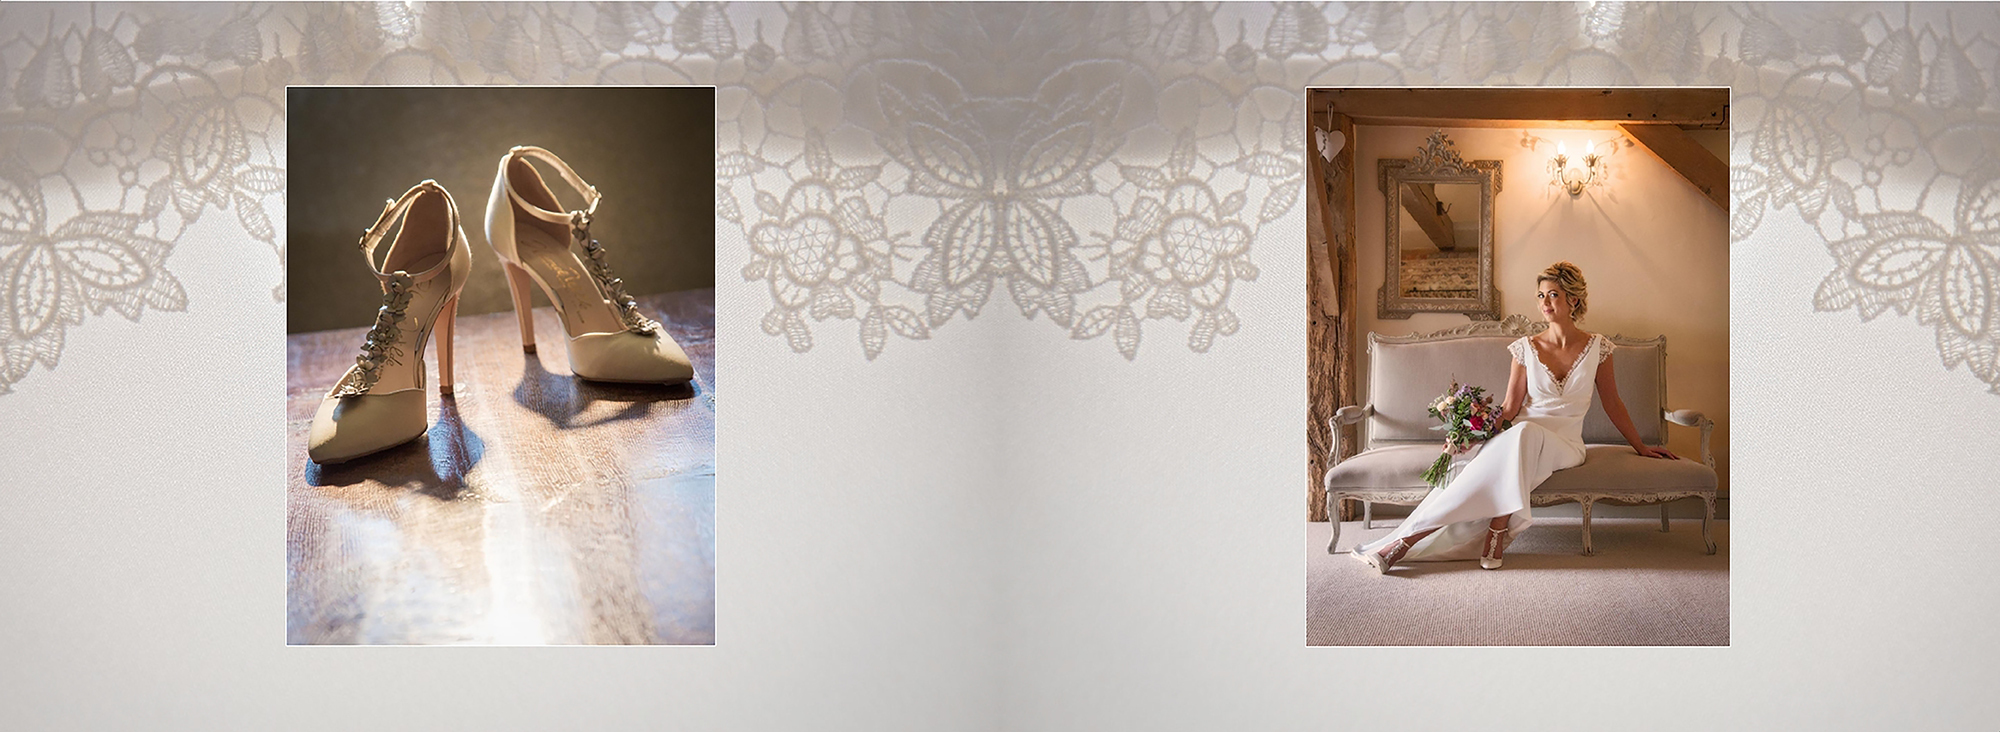 KHP_wedding-album.jpg#asset:2837